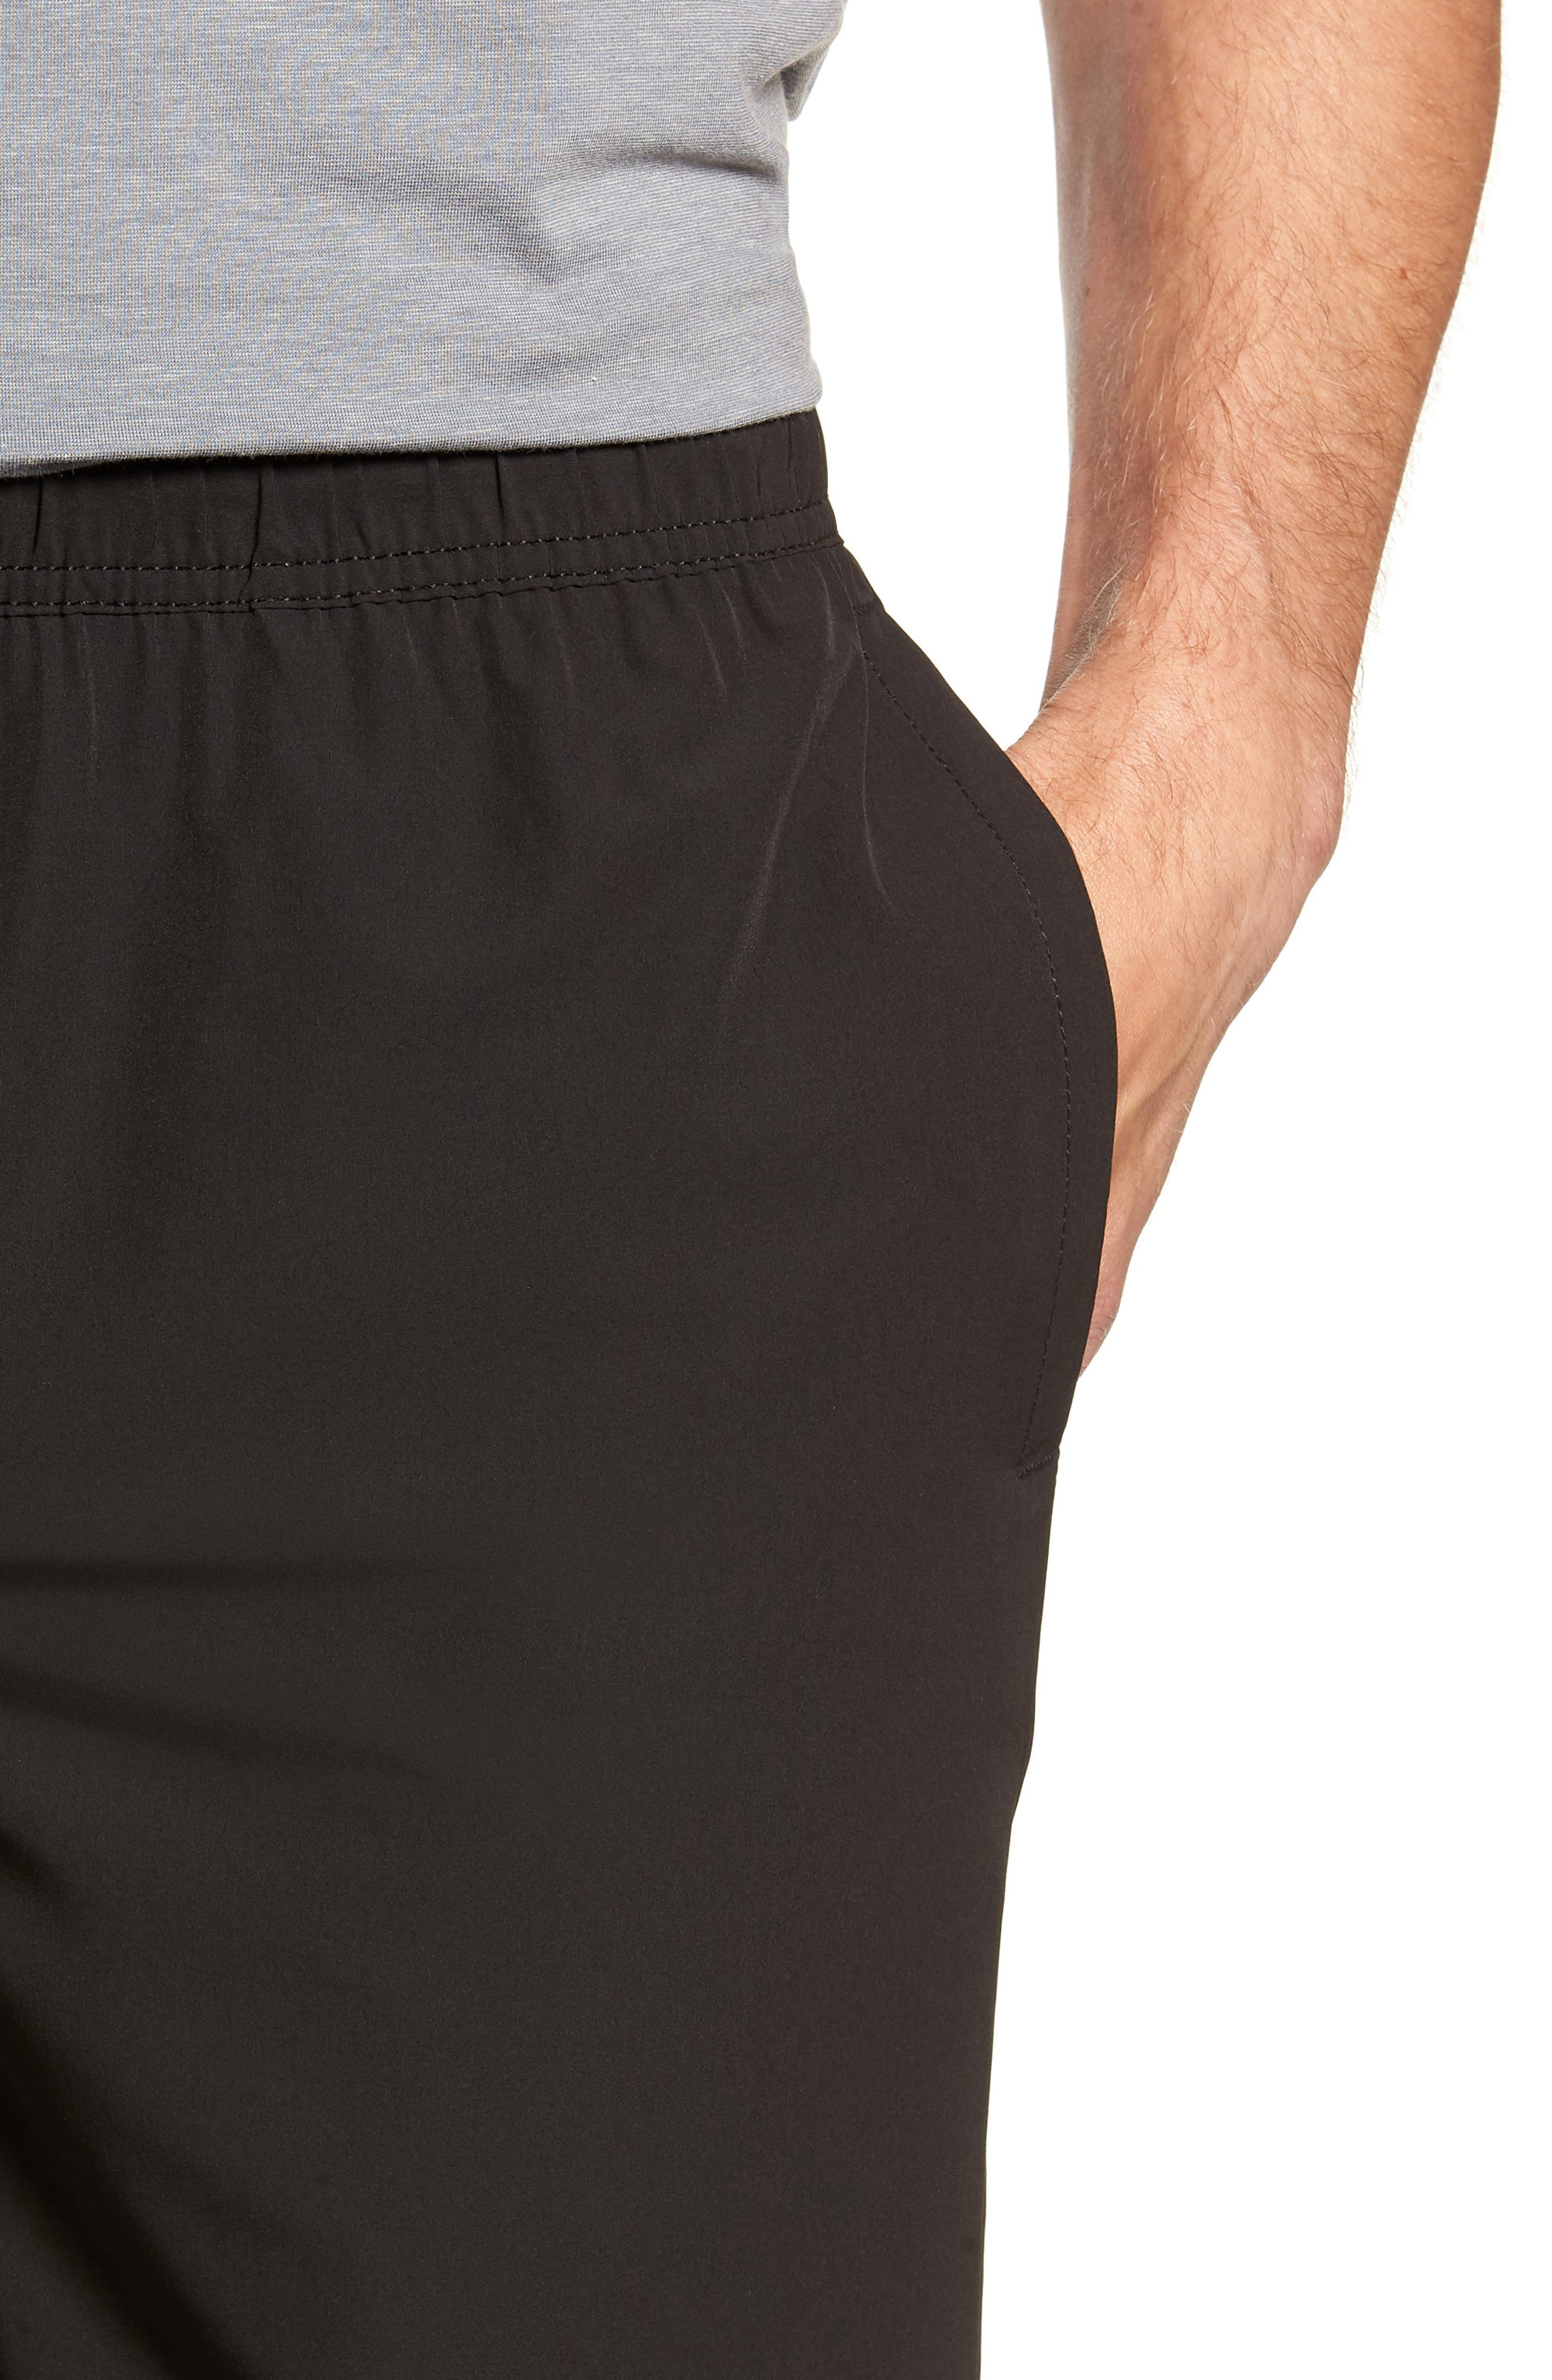 Deering Shorts,                             Alternate thumbnail 4, color,                             BLACK